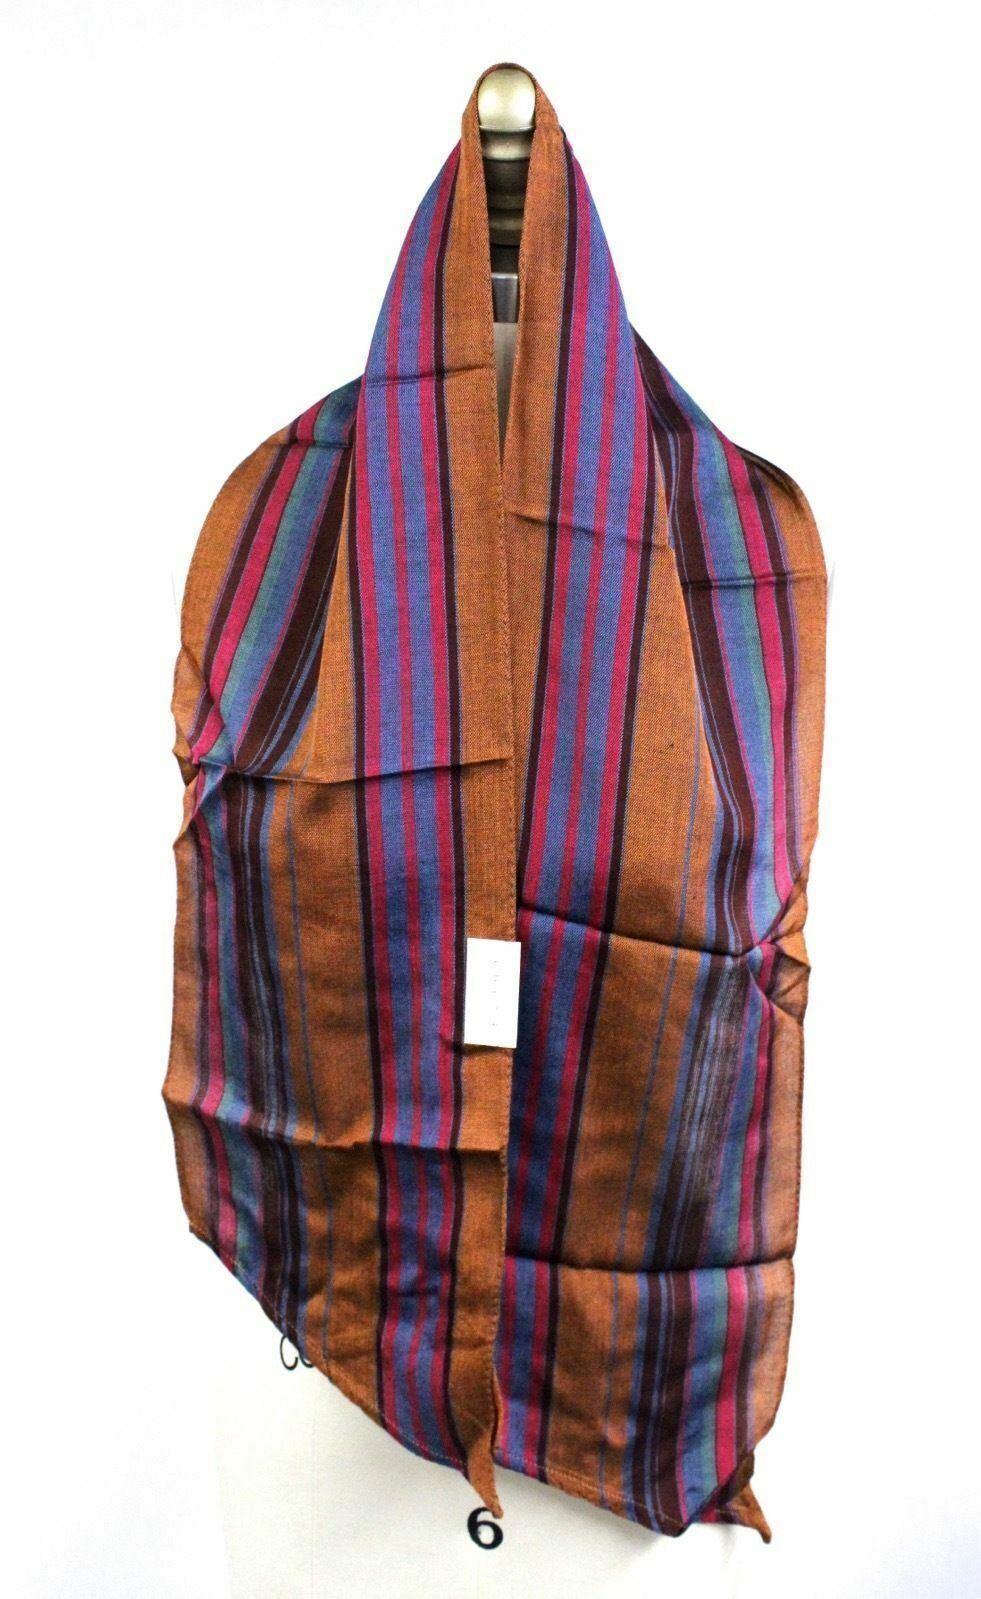 VTG Echo Scarf NWT 1970s Oblong Striped Great Colors Rust Fuchsia 54x8 Rayon - $17.56